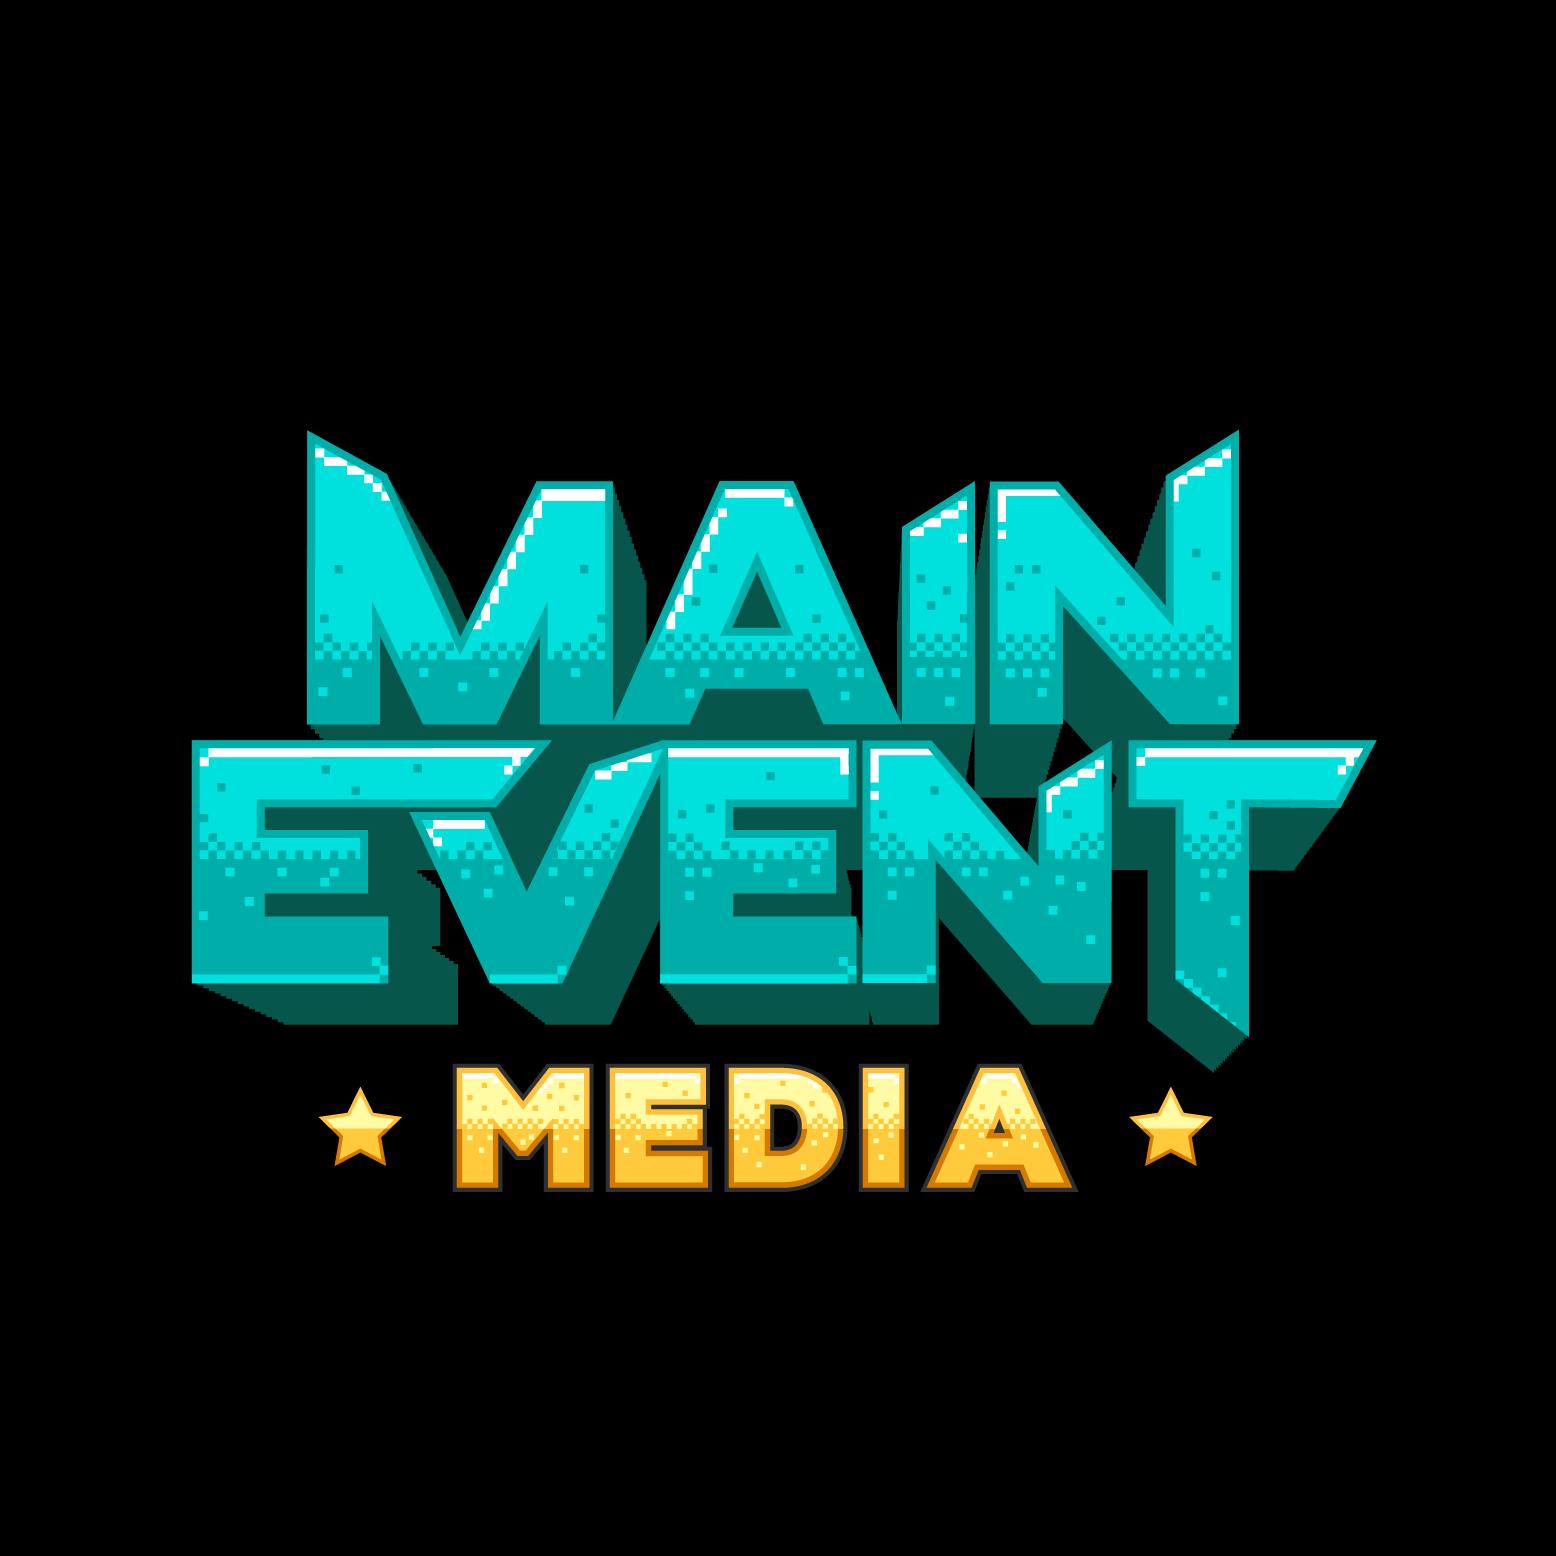 main-event-media-logo